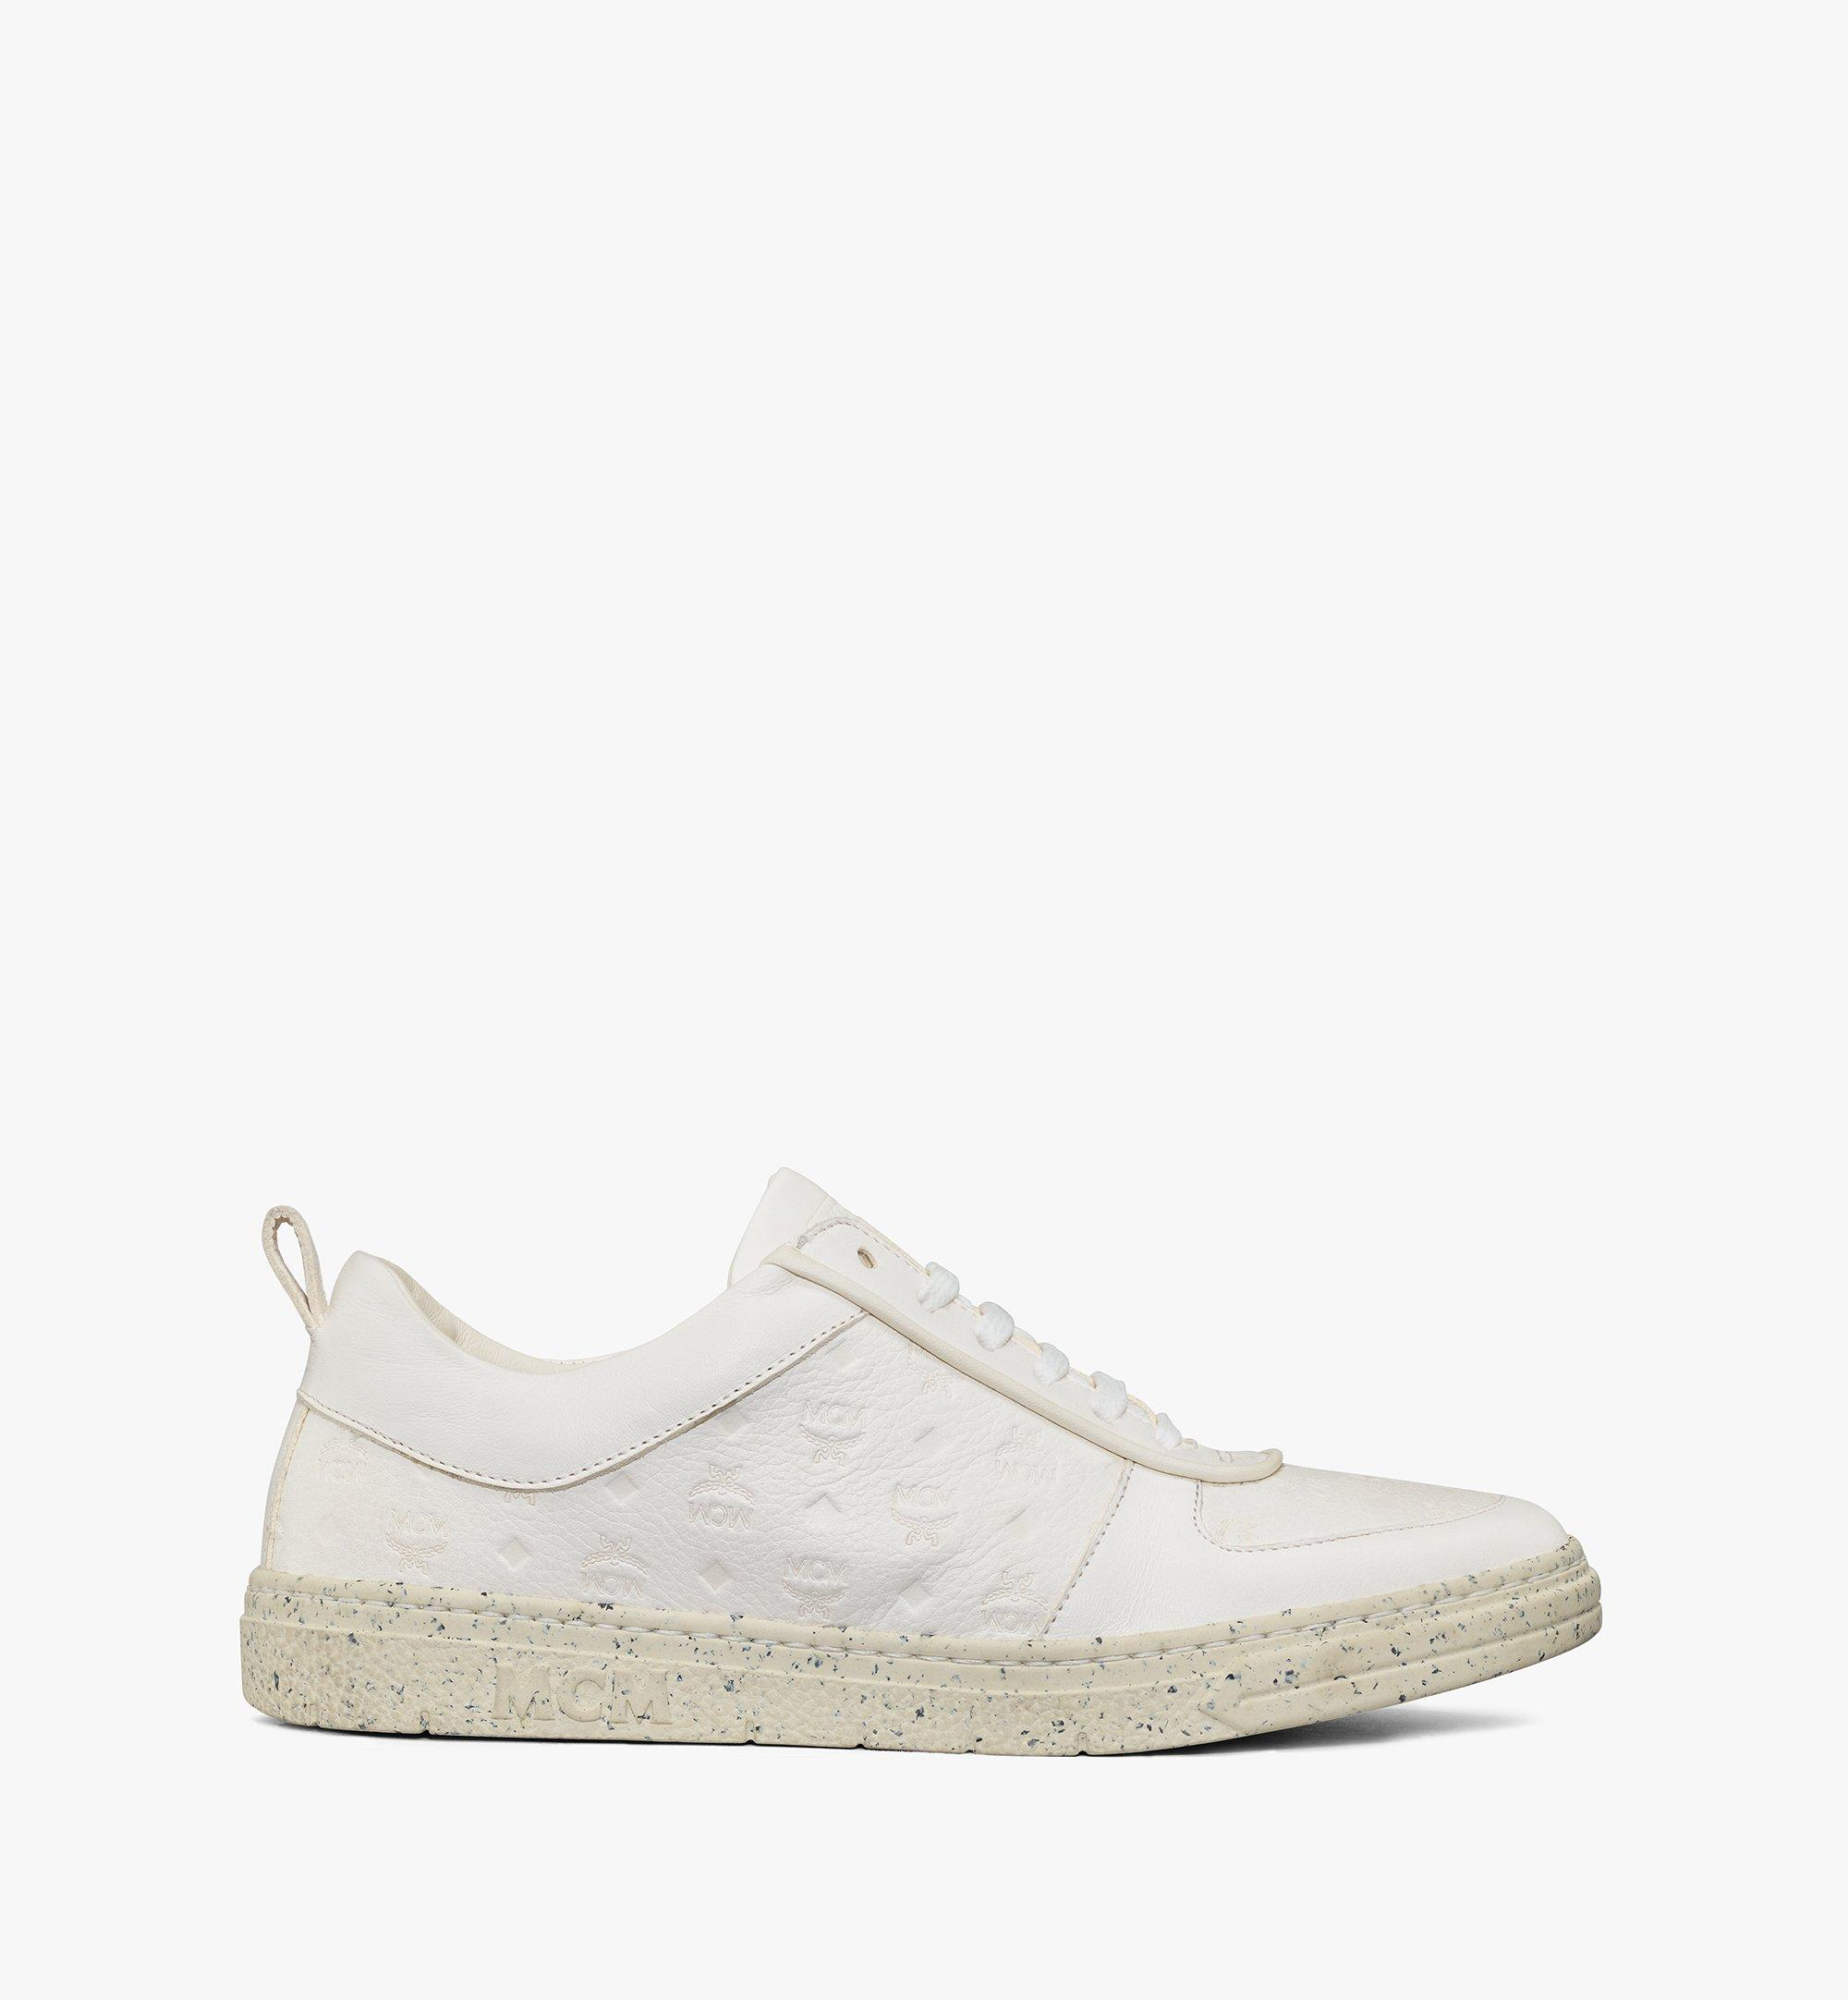 MCM รองเท้าผ้าใบสำหรับผู้หญิง Terrain Lo ผลิตจากวัสดุที่ยั่งยืน White MESAAMM18WT036 มุมมองอื่น 3